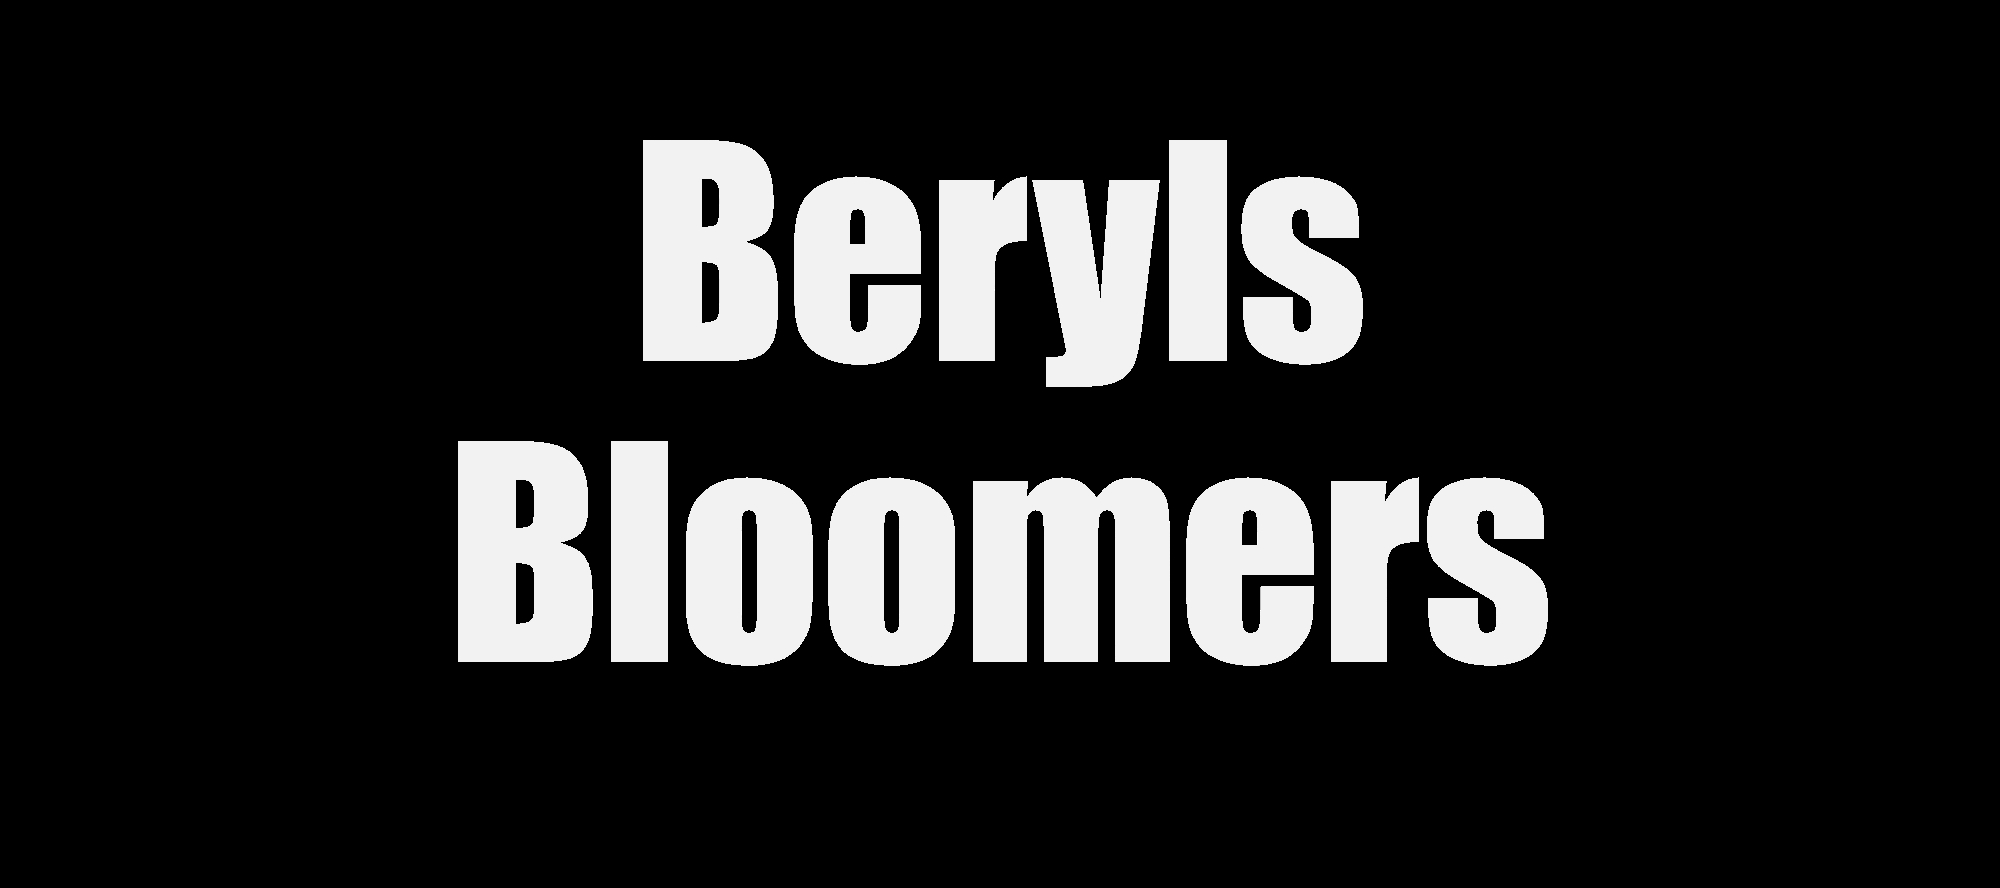 Beryl's Bloomers - Florists & Flower Shops